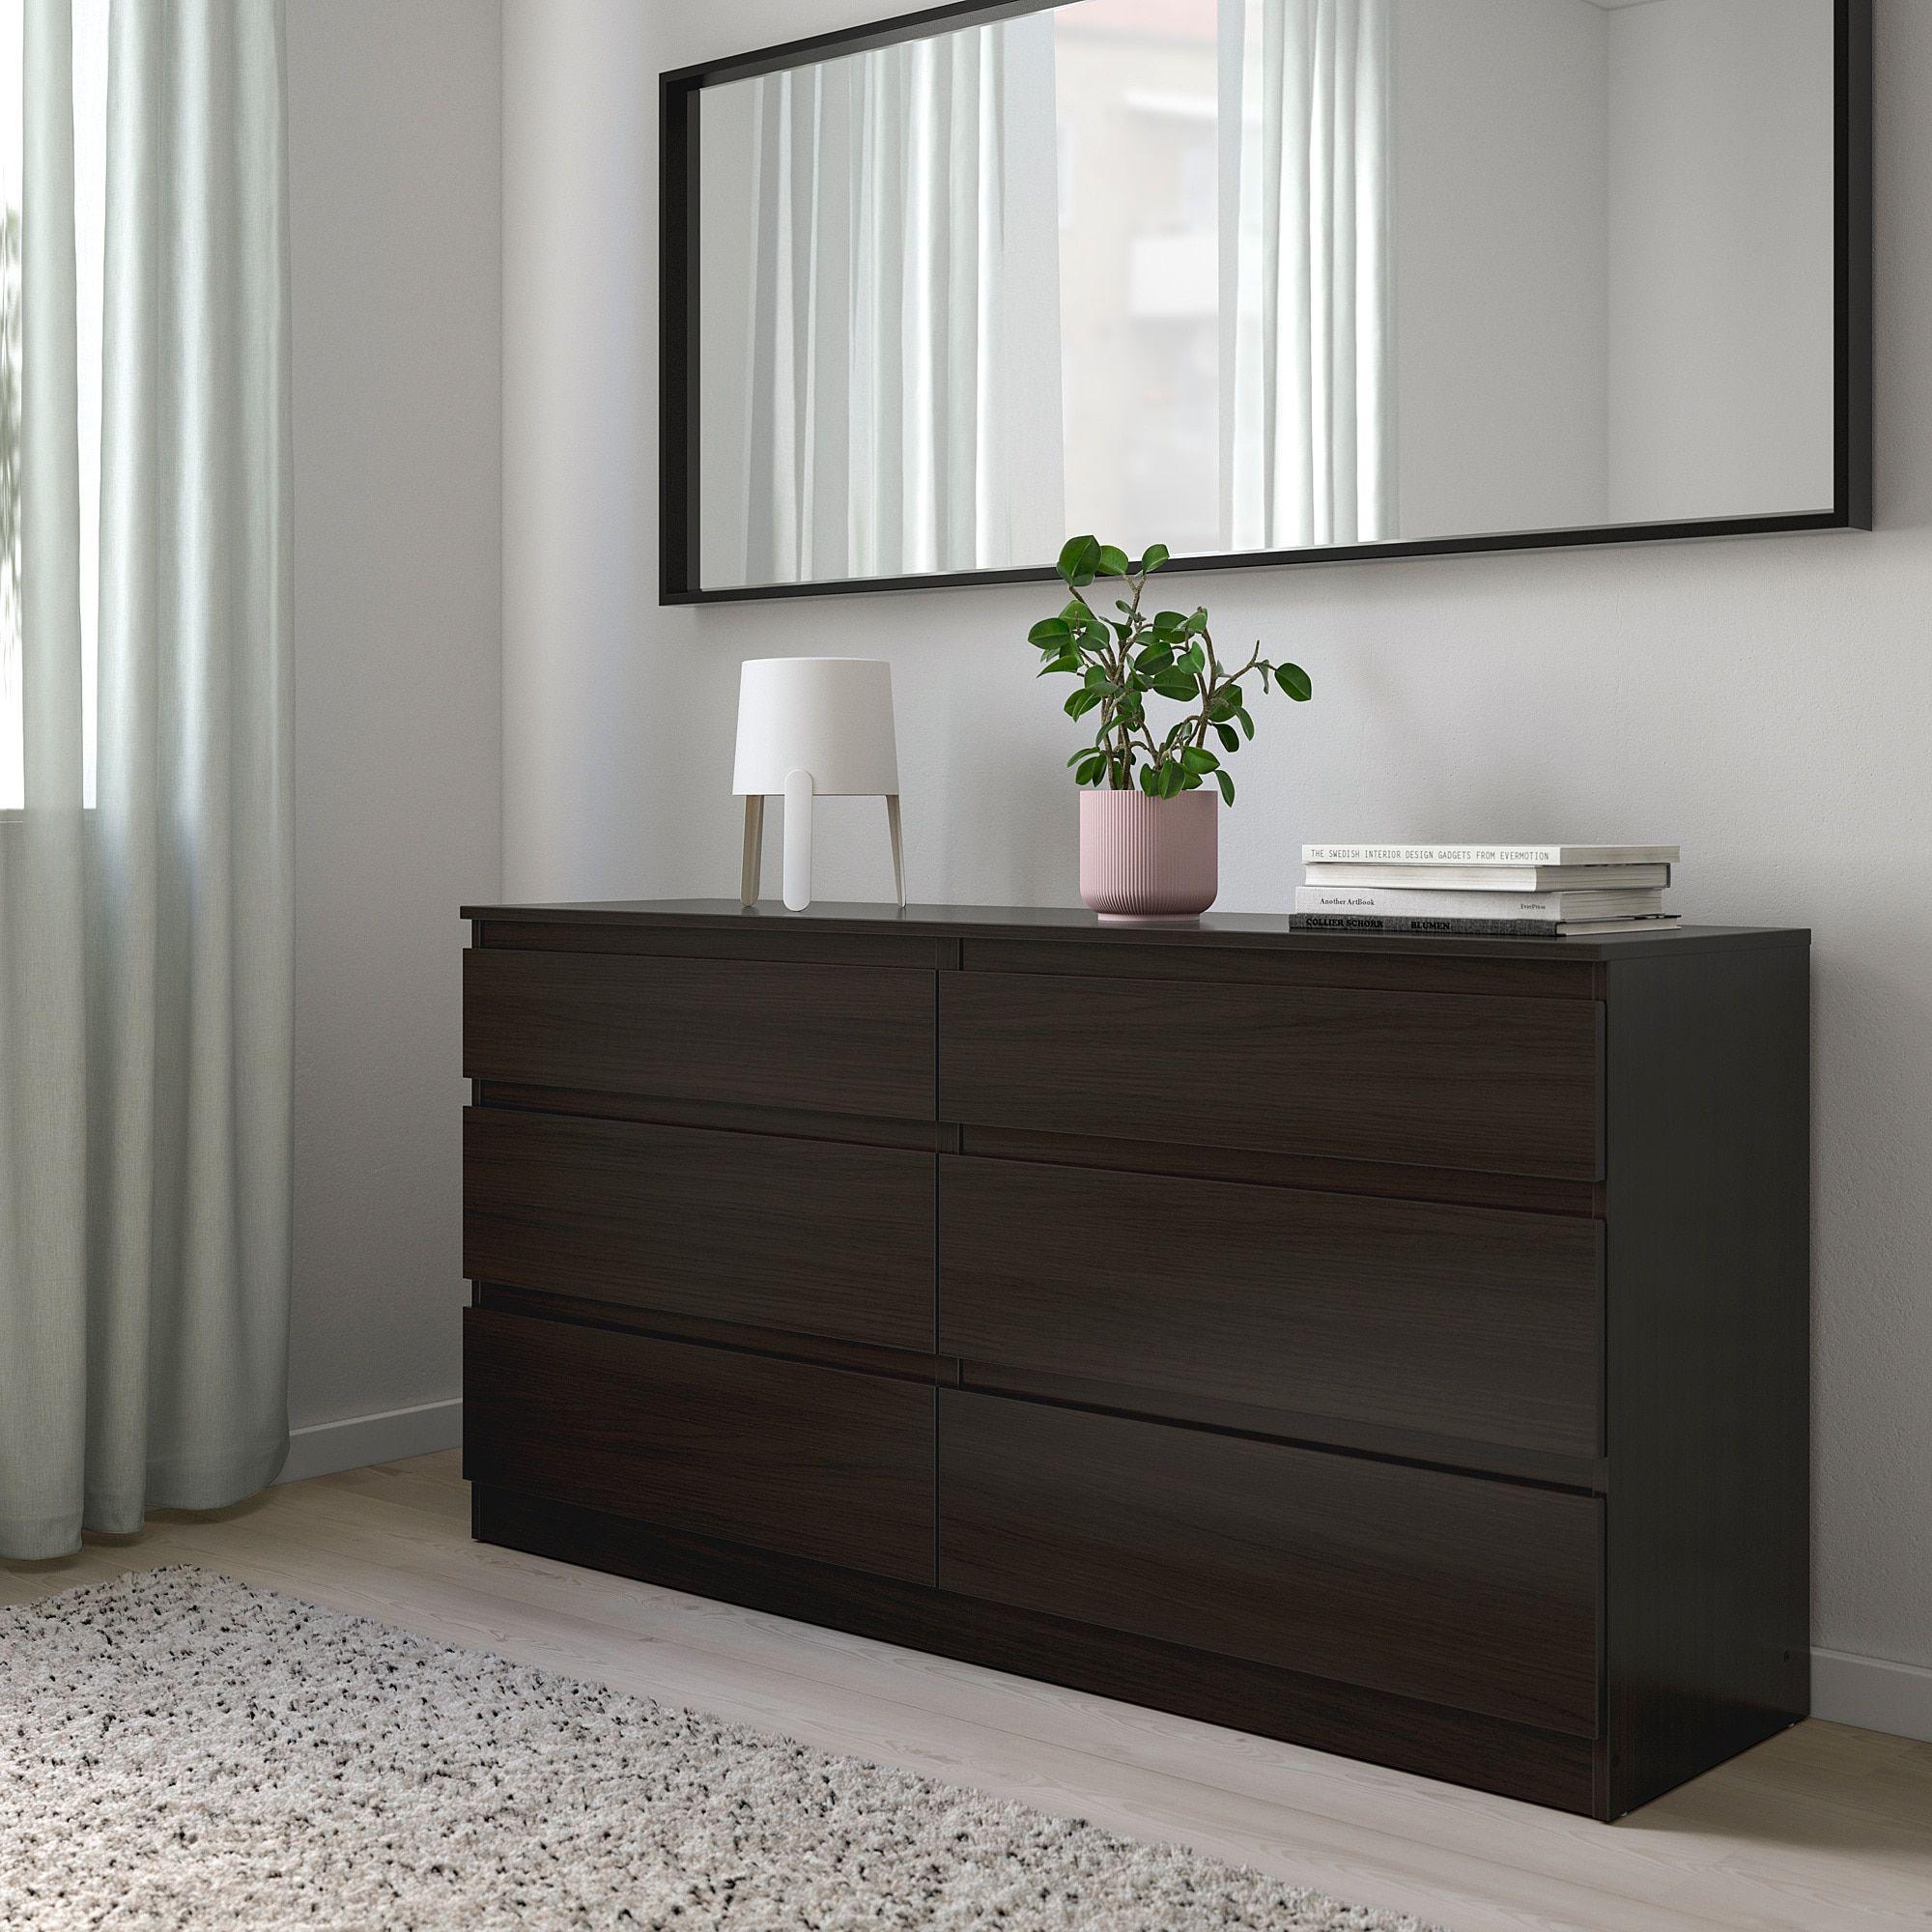 Ikea Kullen 6 Drawer Dresser Black Brown Dresser Drawers 6 Drawer Dresser At Home Furniture Store [ 2000 x 2000 Pixel ]